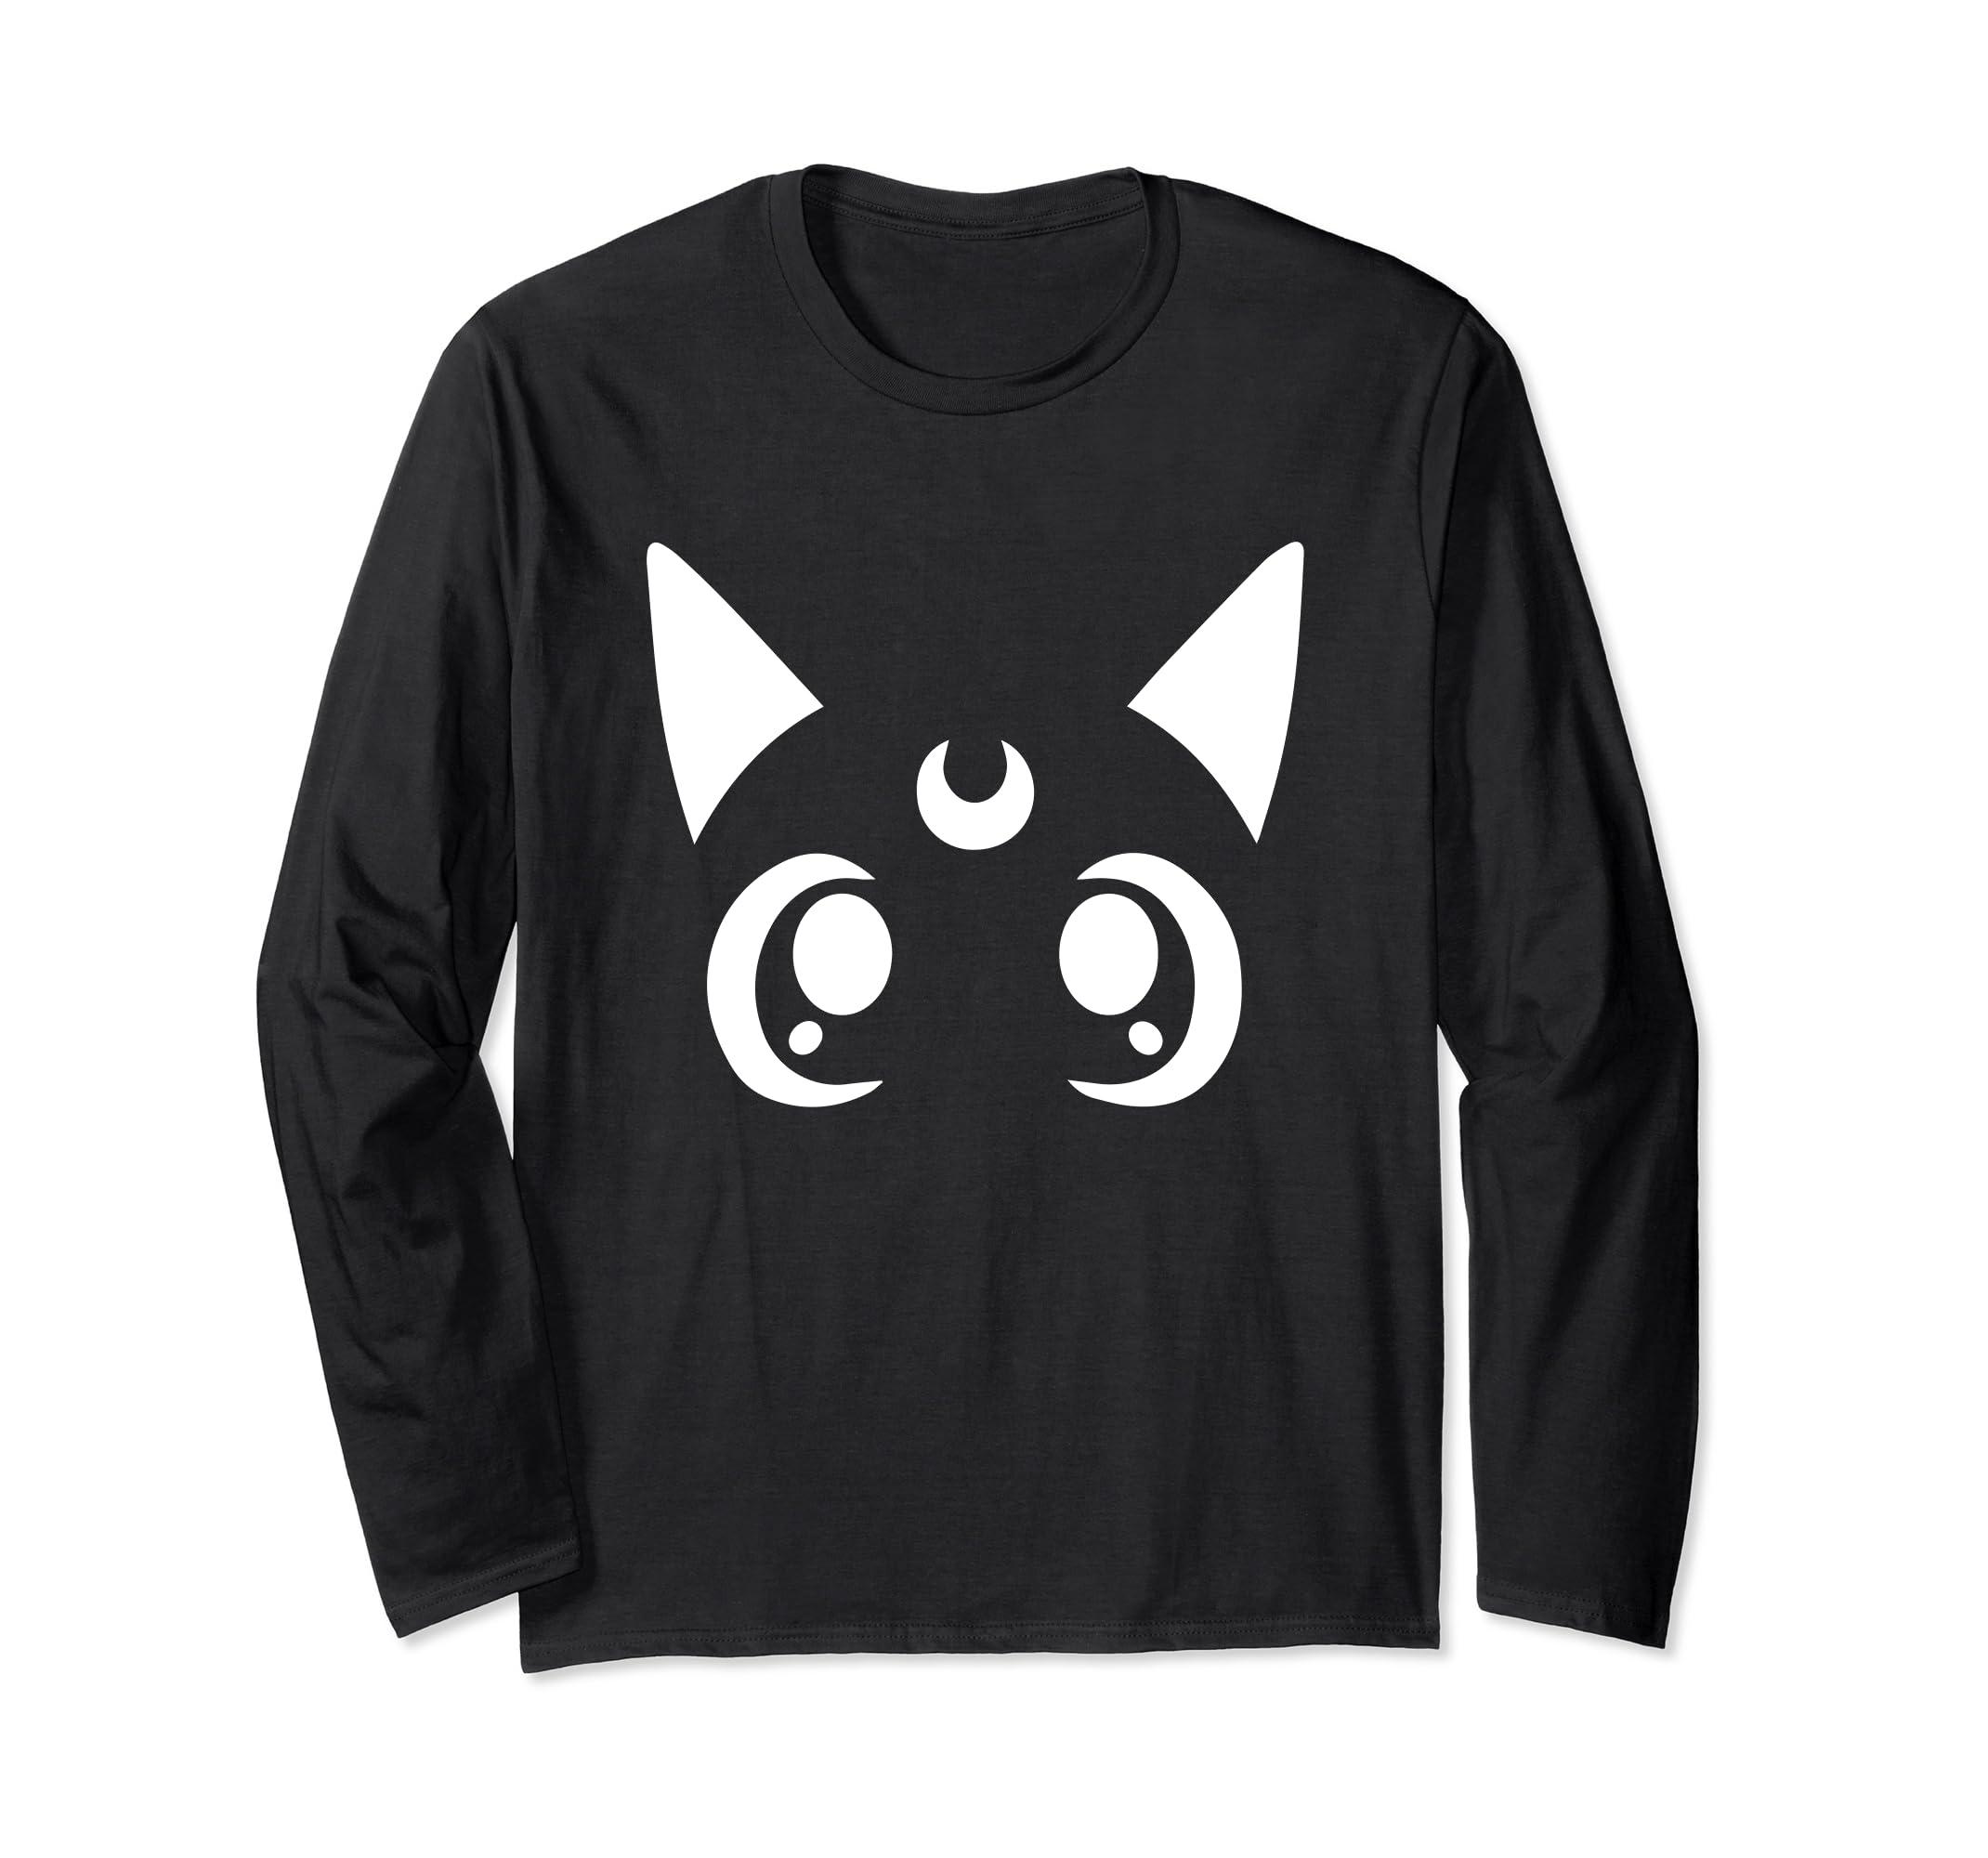 Magical Sailor Cat Face Crescent Moon Anime Nerdy Shirt-ln